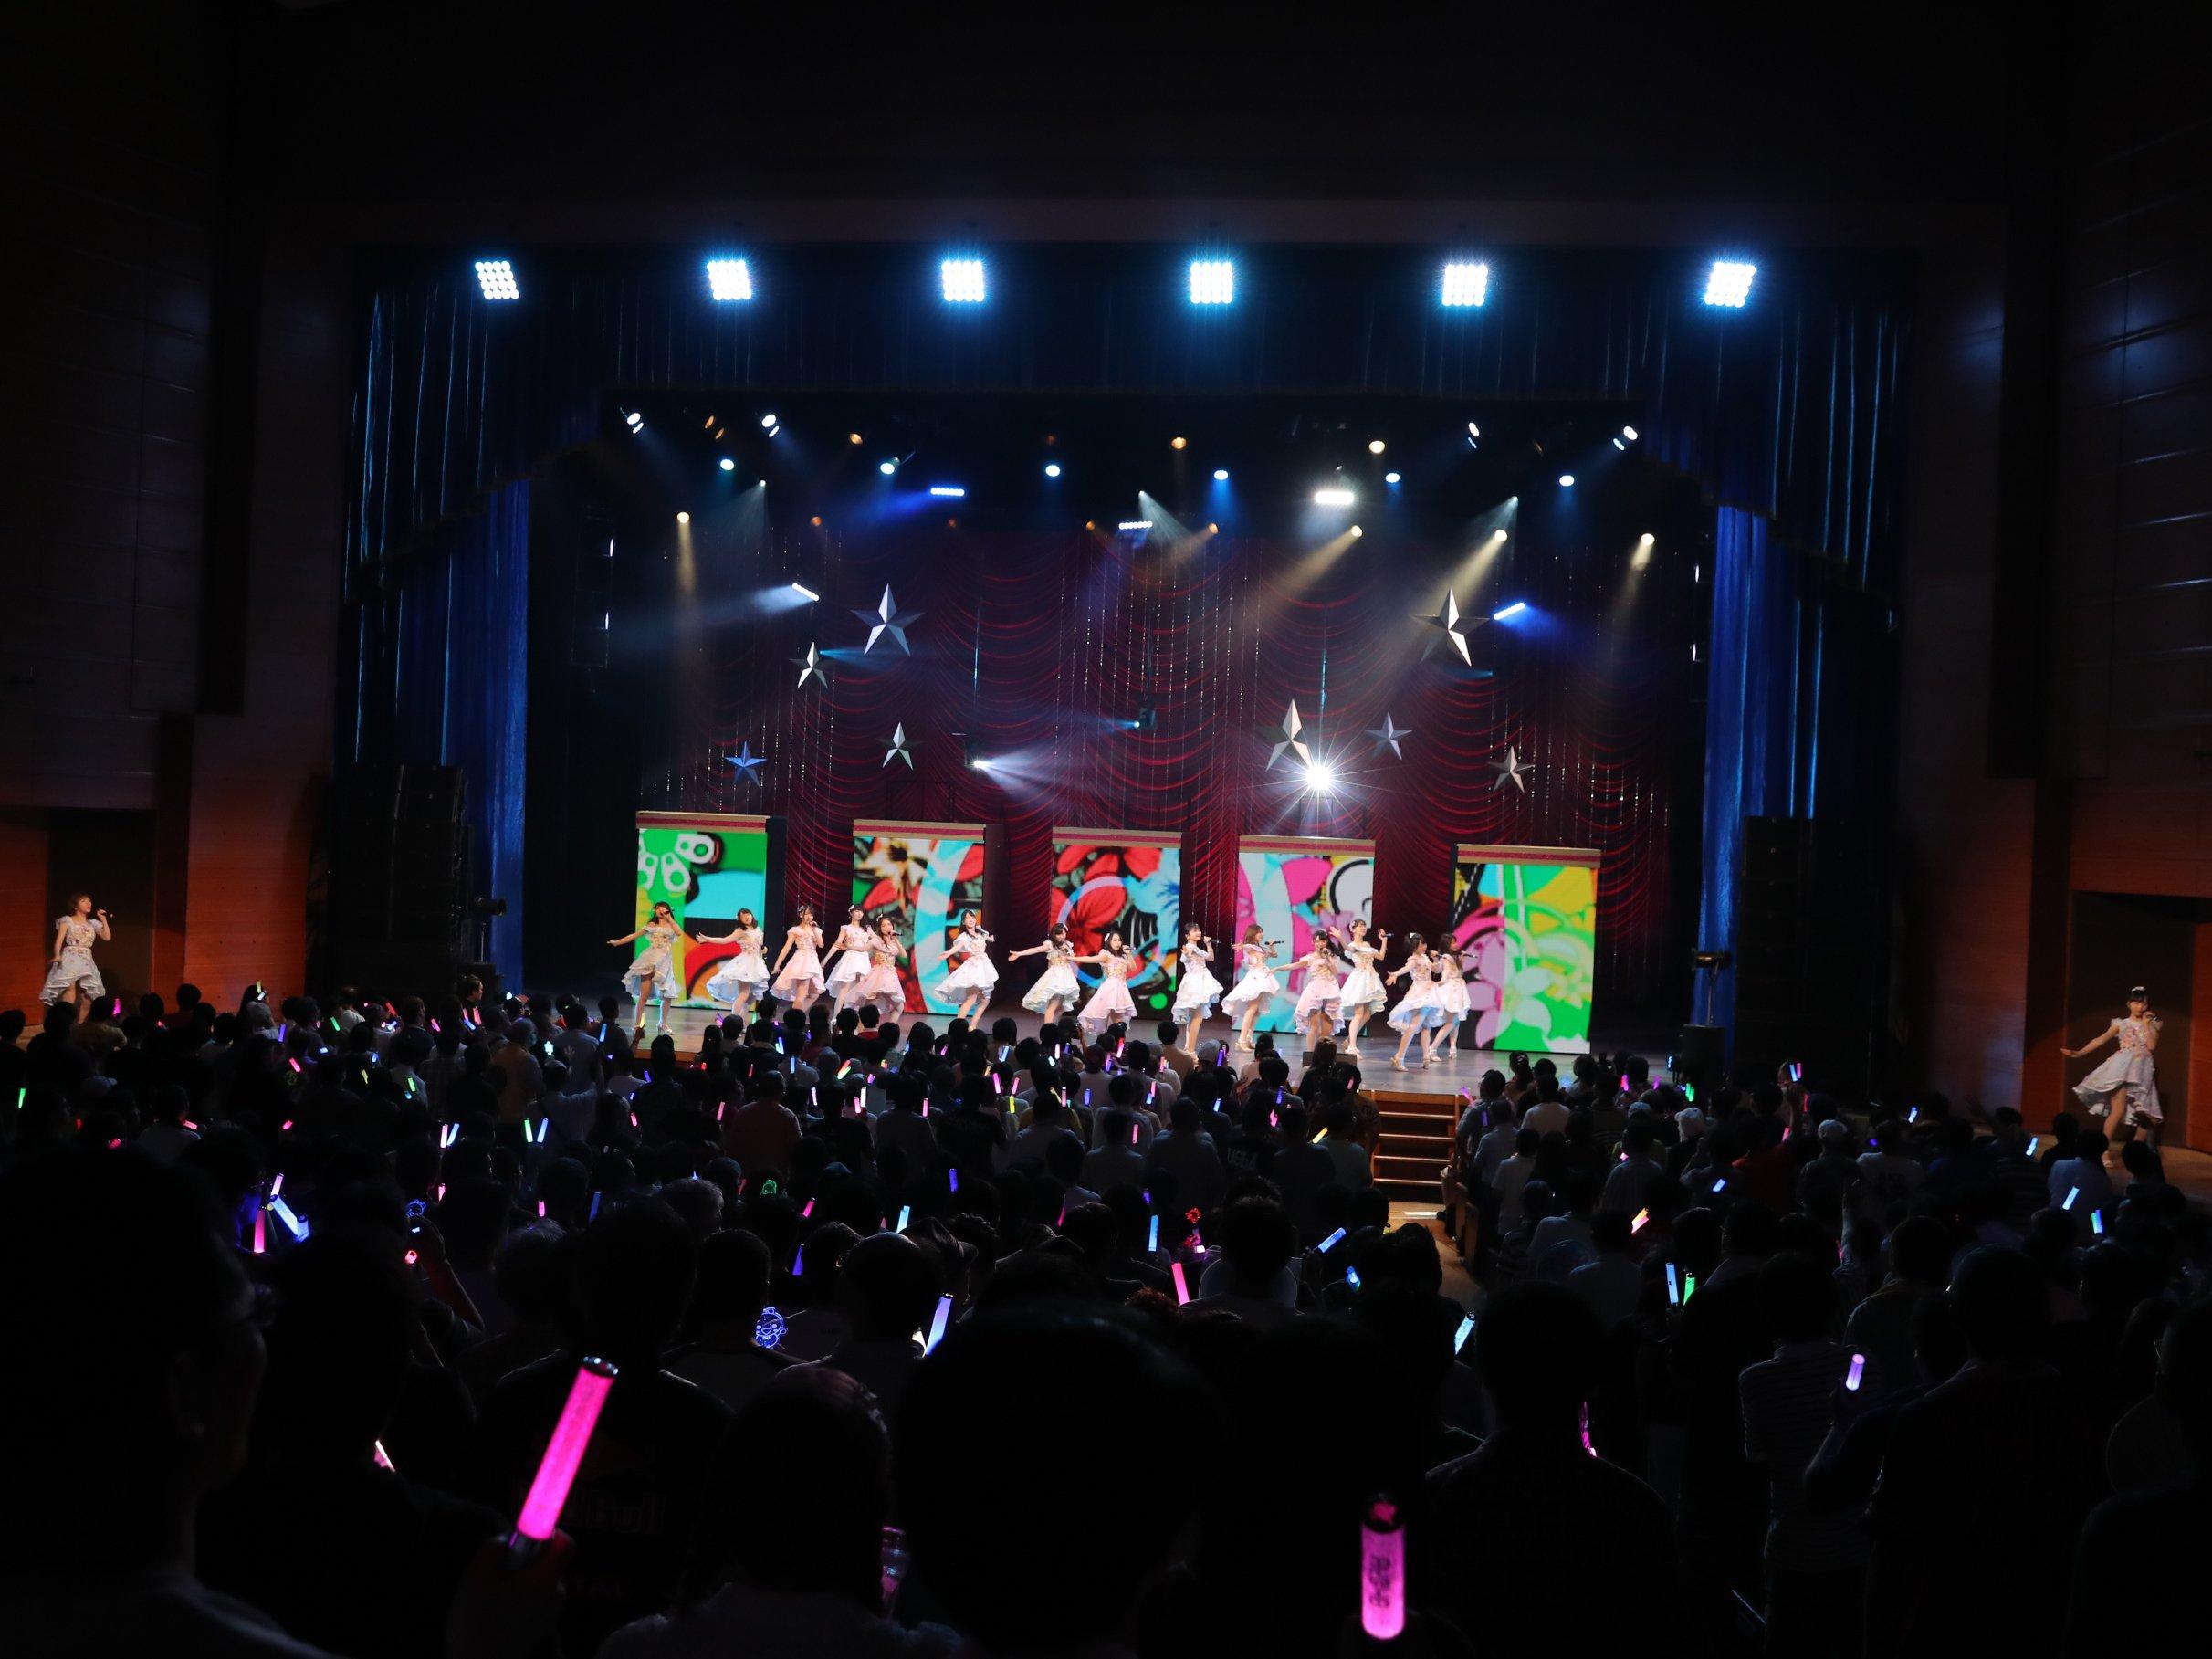 AKB48メンバーが浴衣で登場!4年ぶりのツアーがスタート【写真8枚】の画像002